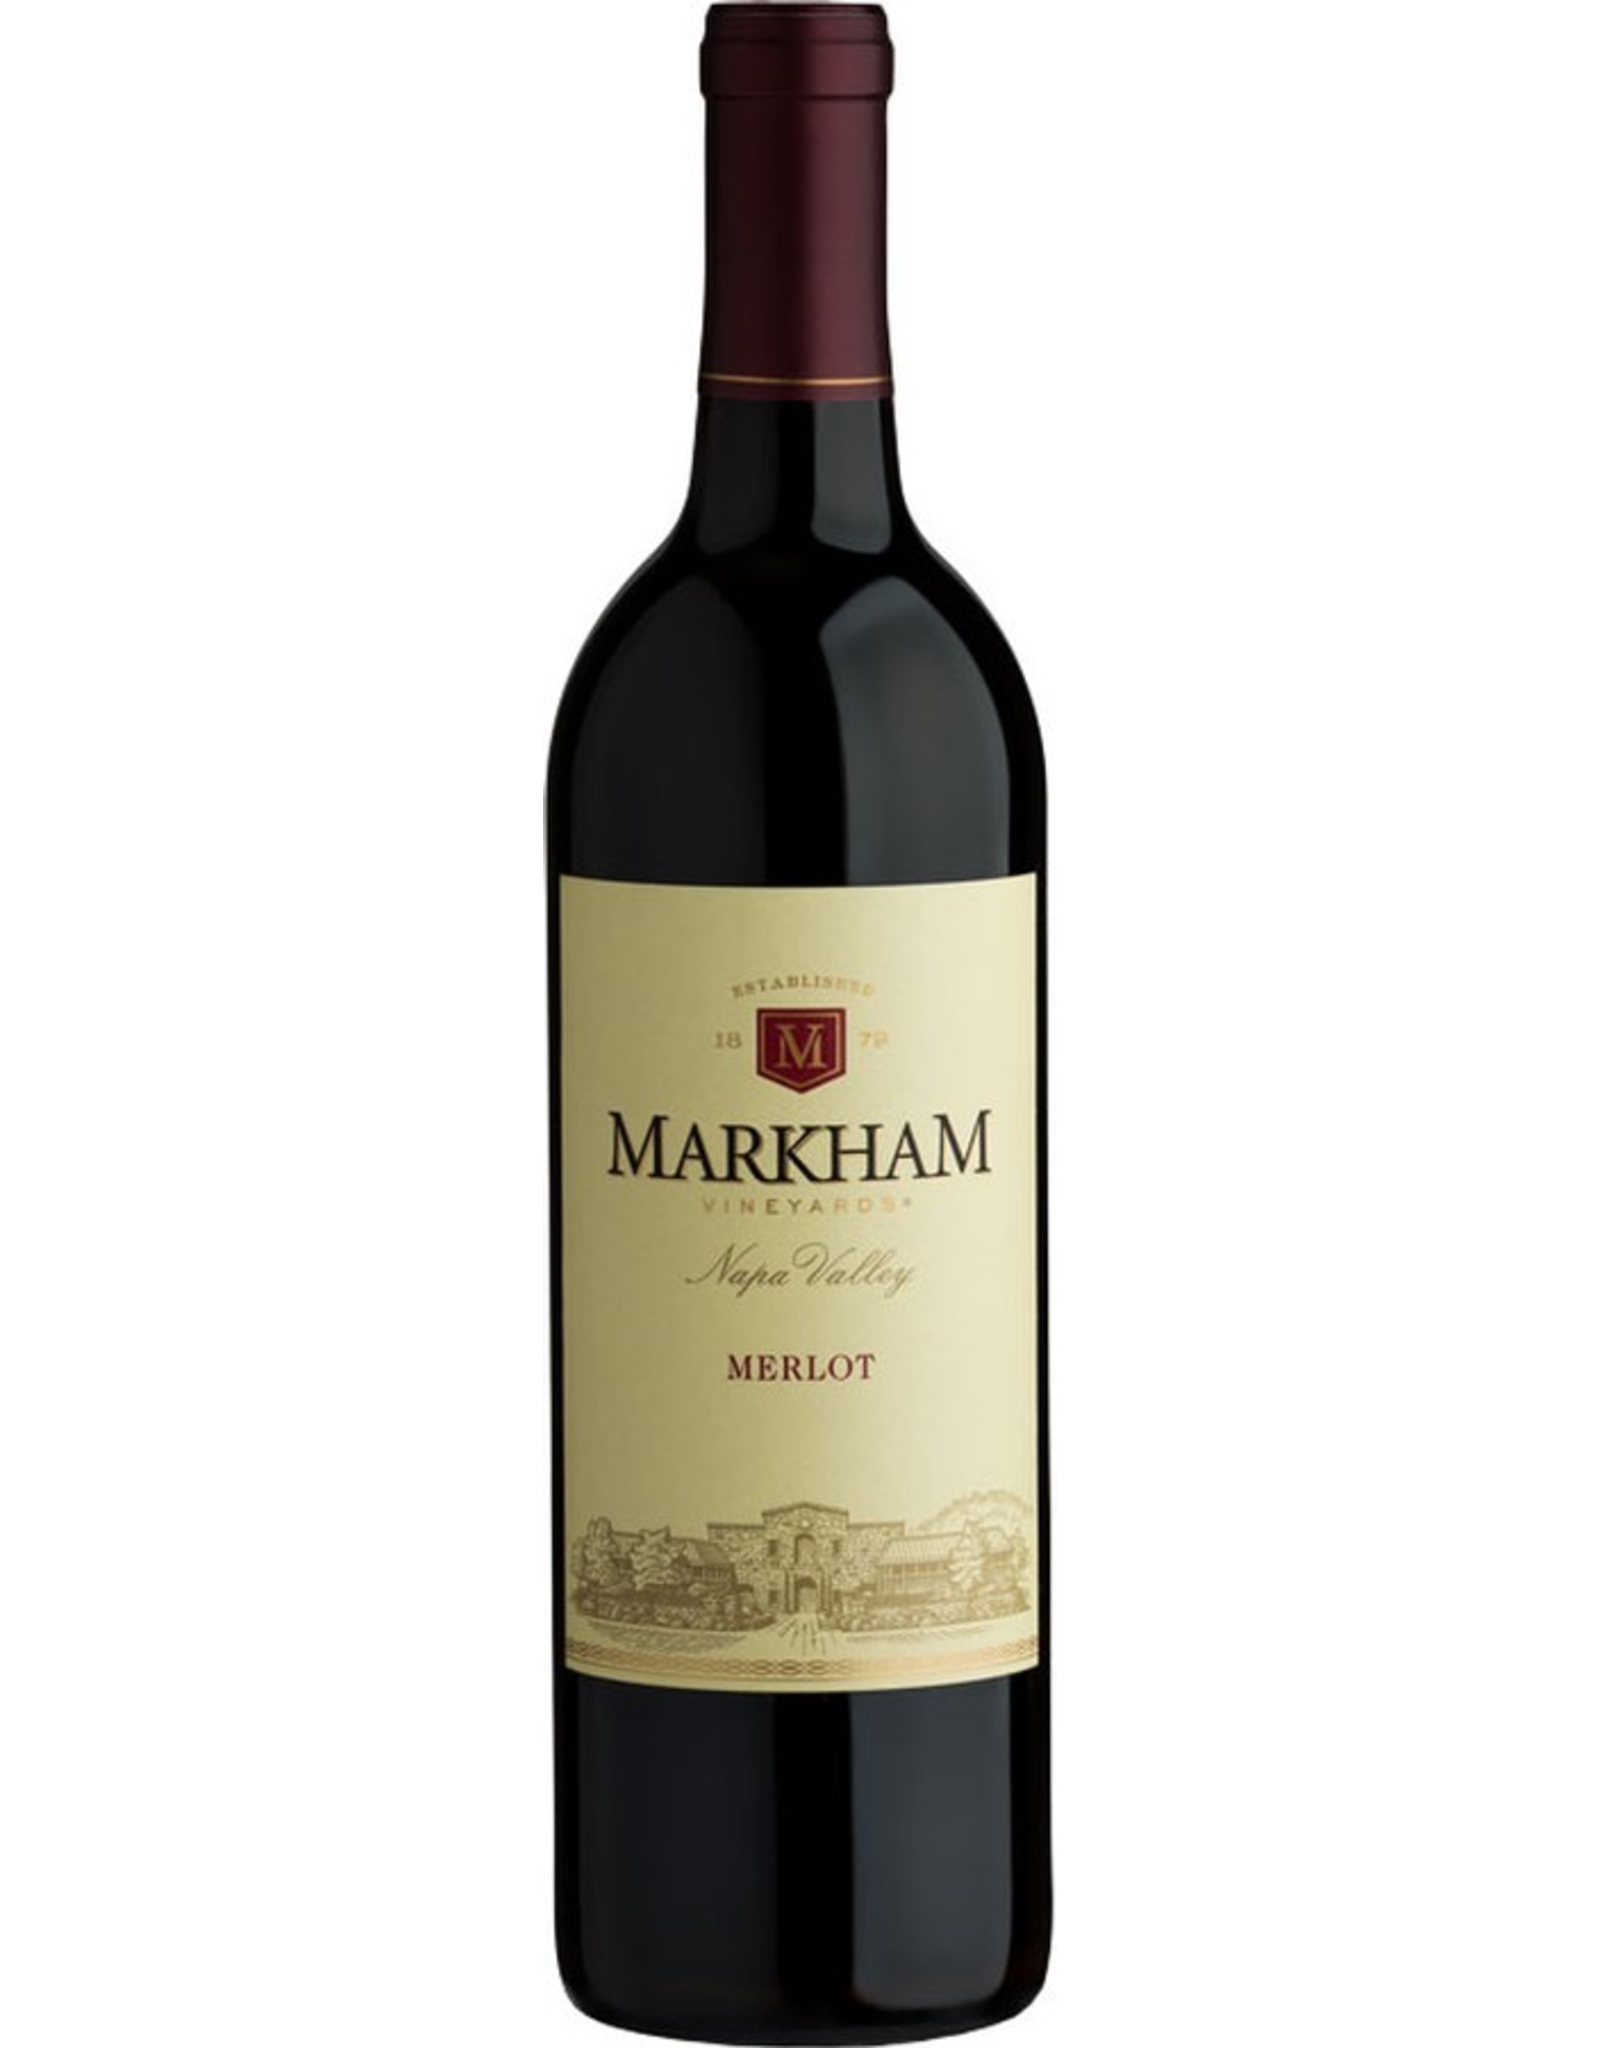 Red Wine 2017 Markham Vineyards, Merlot, Napa, Napa Valley, California, 14.2% Alc, CTnr